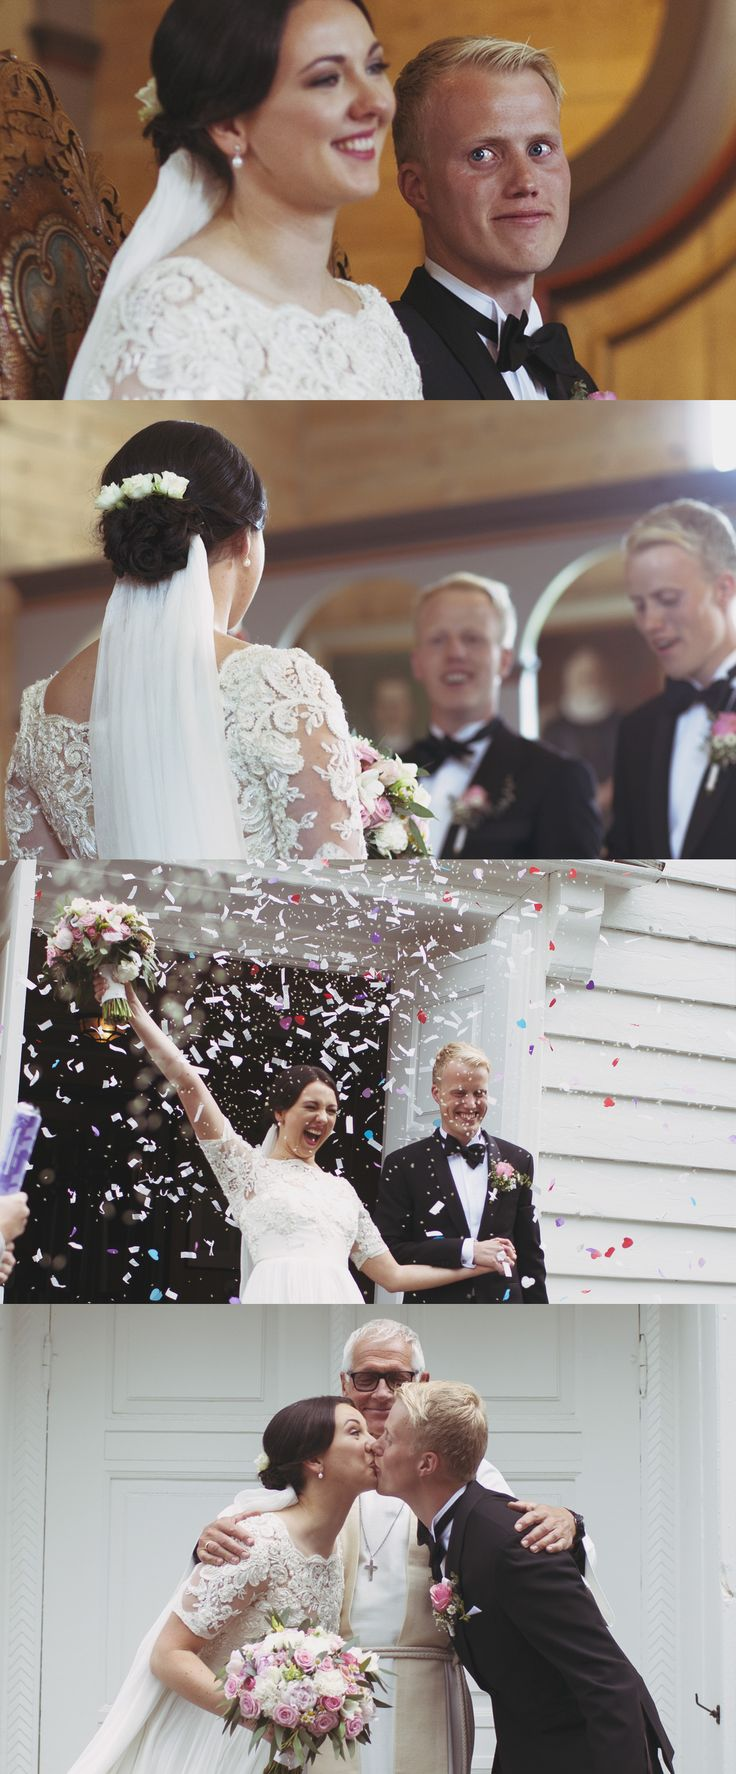 Wedding in Norway Hardanger - by Miriamfoto #wedding  #bride #miriamfoto #norskfotograf #bryllup #hardangerbryllup #weddinginnorway #weddingday